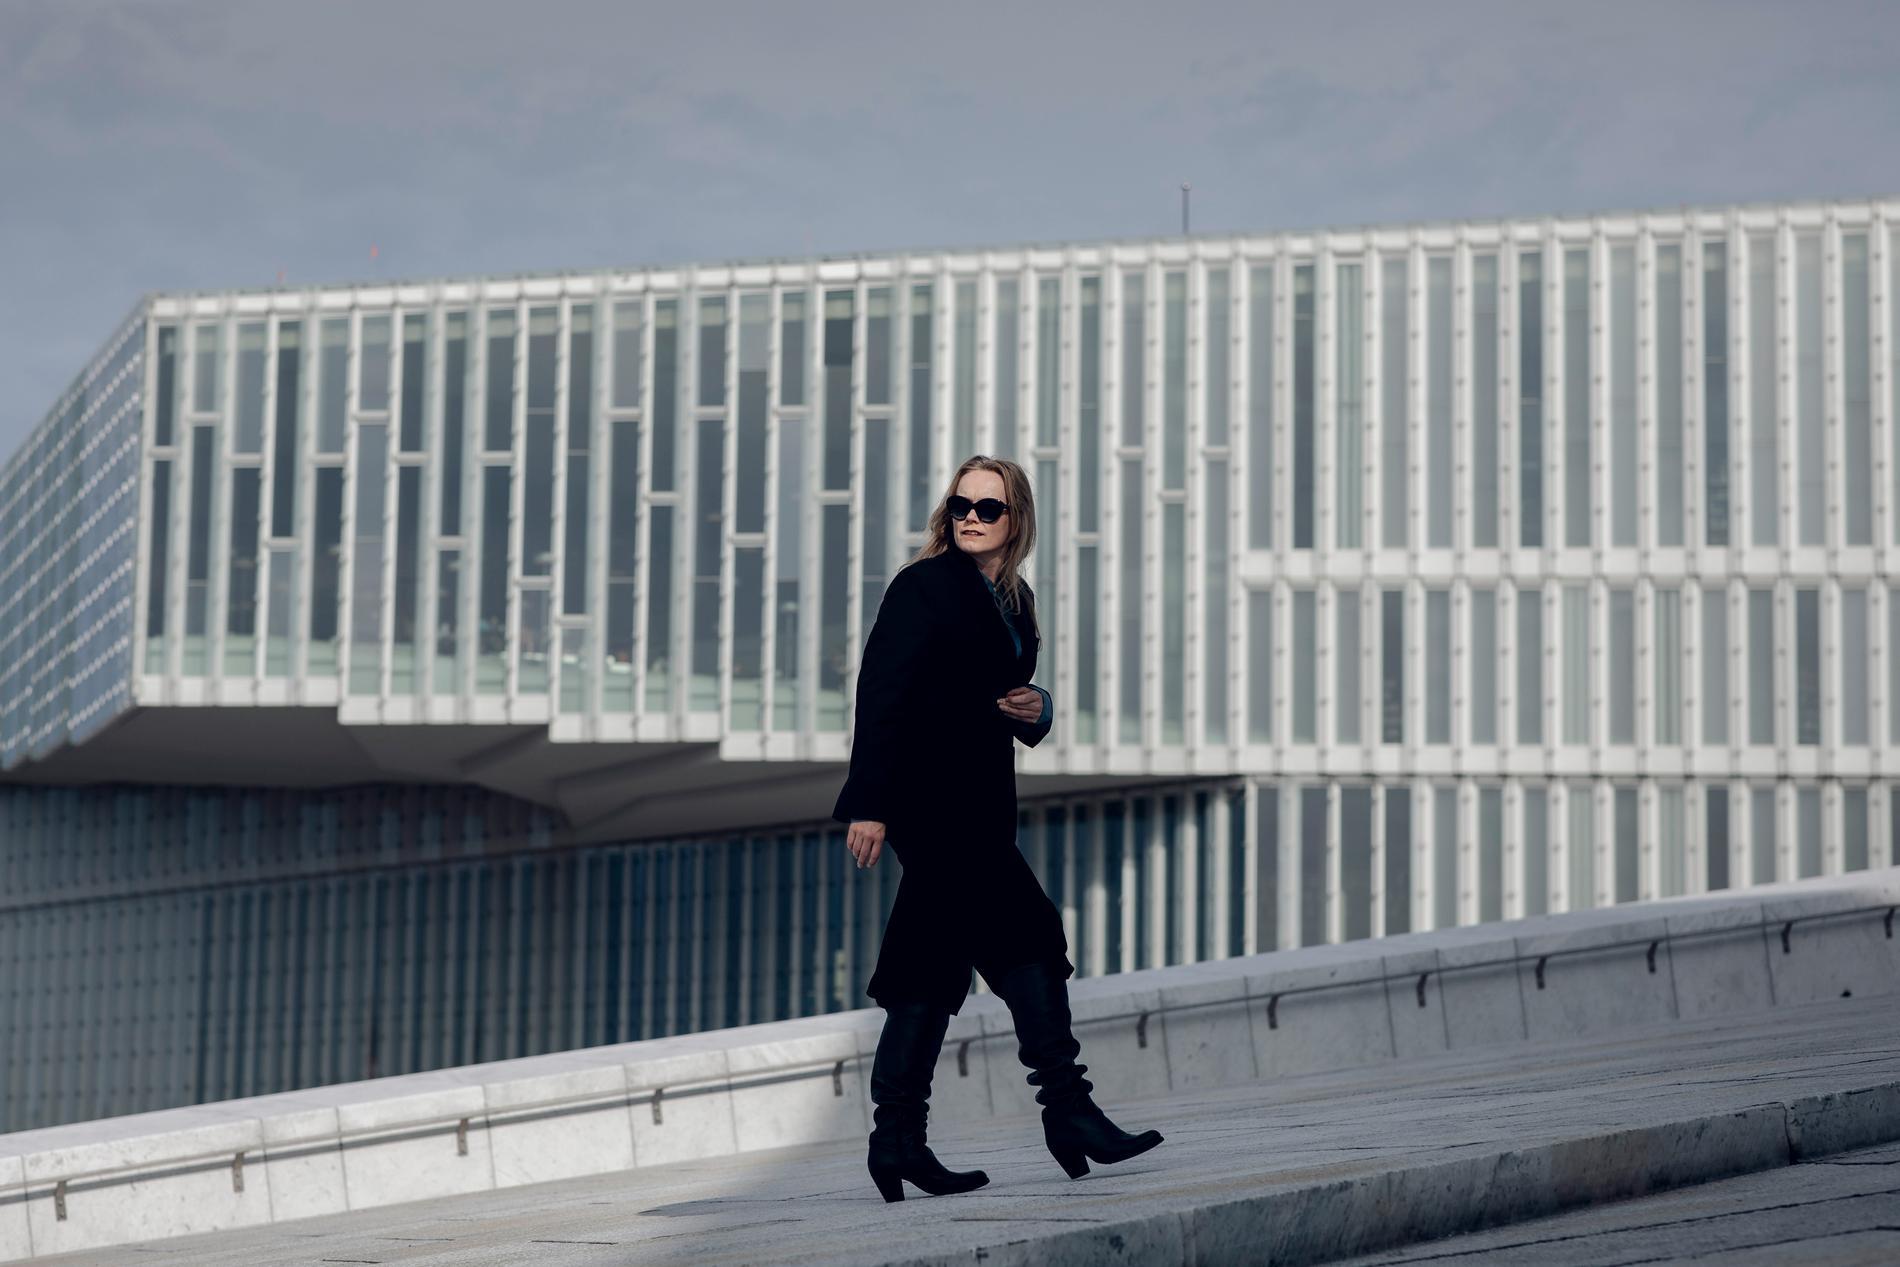 Efter 20 år i Stockholm har Ane Brun tillbringat det senaste halvåret i Oslo.